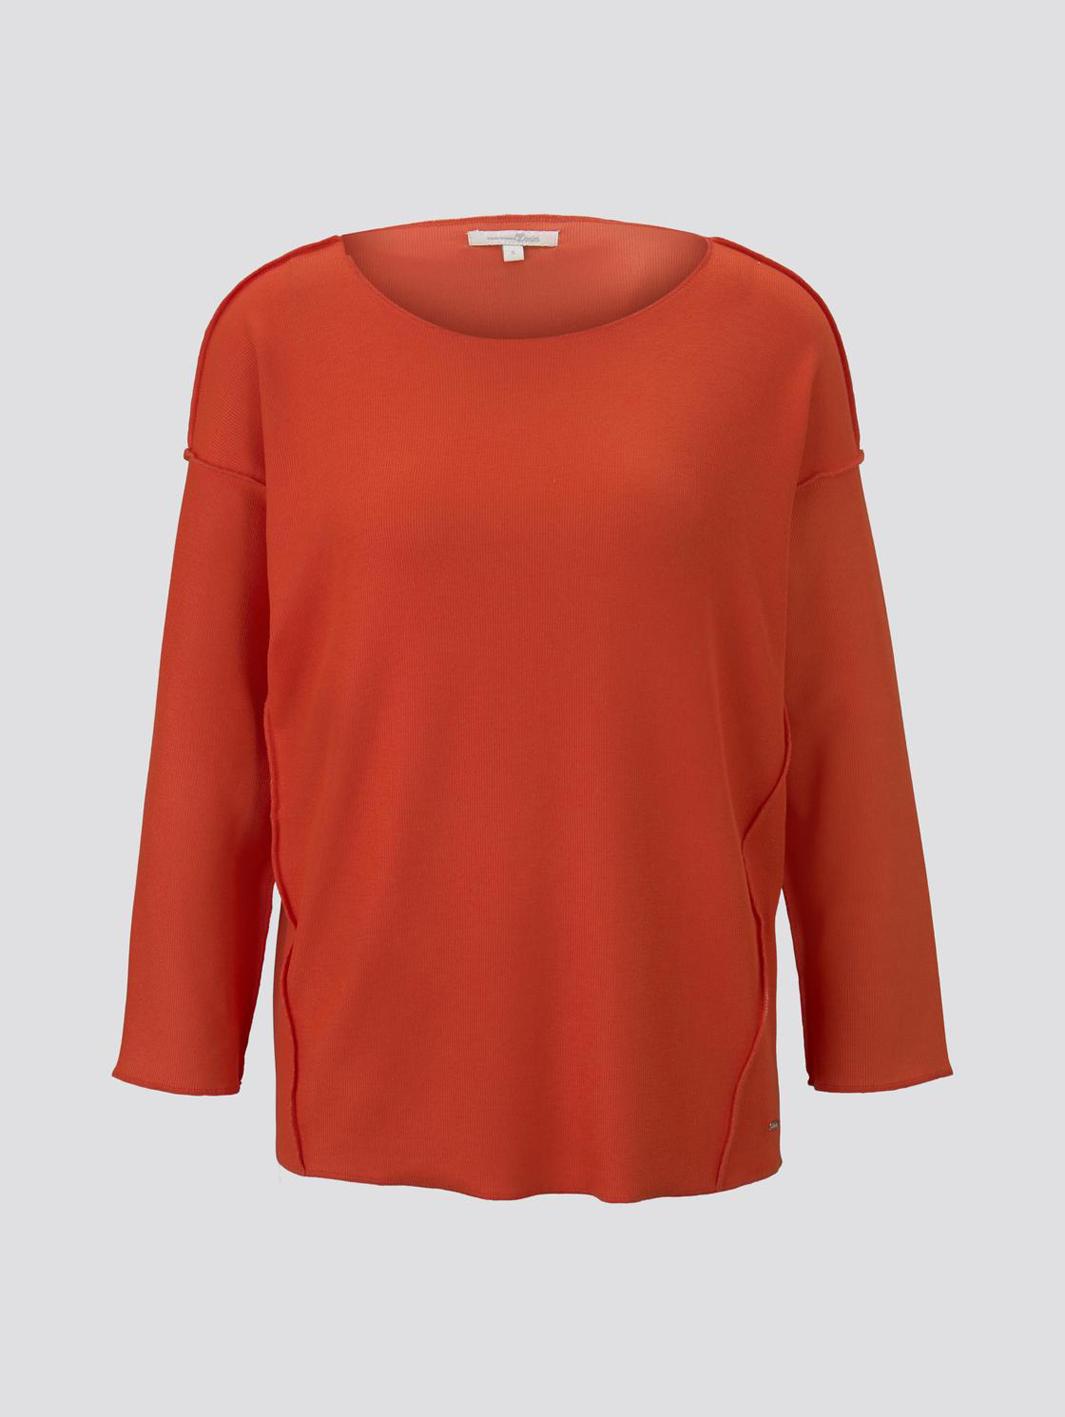 Tom Tailor geripptes Oversized Shirt red